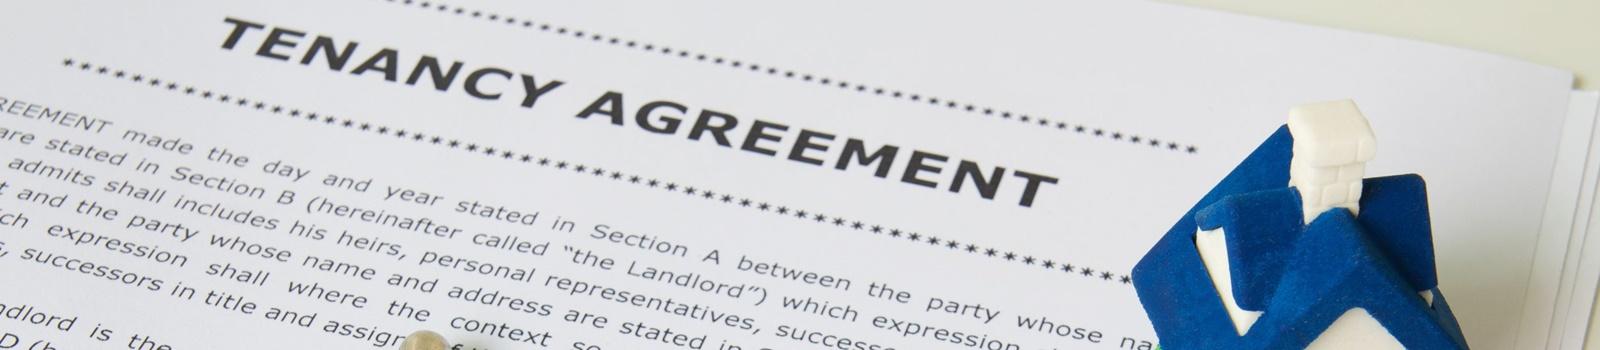 rent house, rent room, tenancy agreement, property